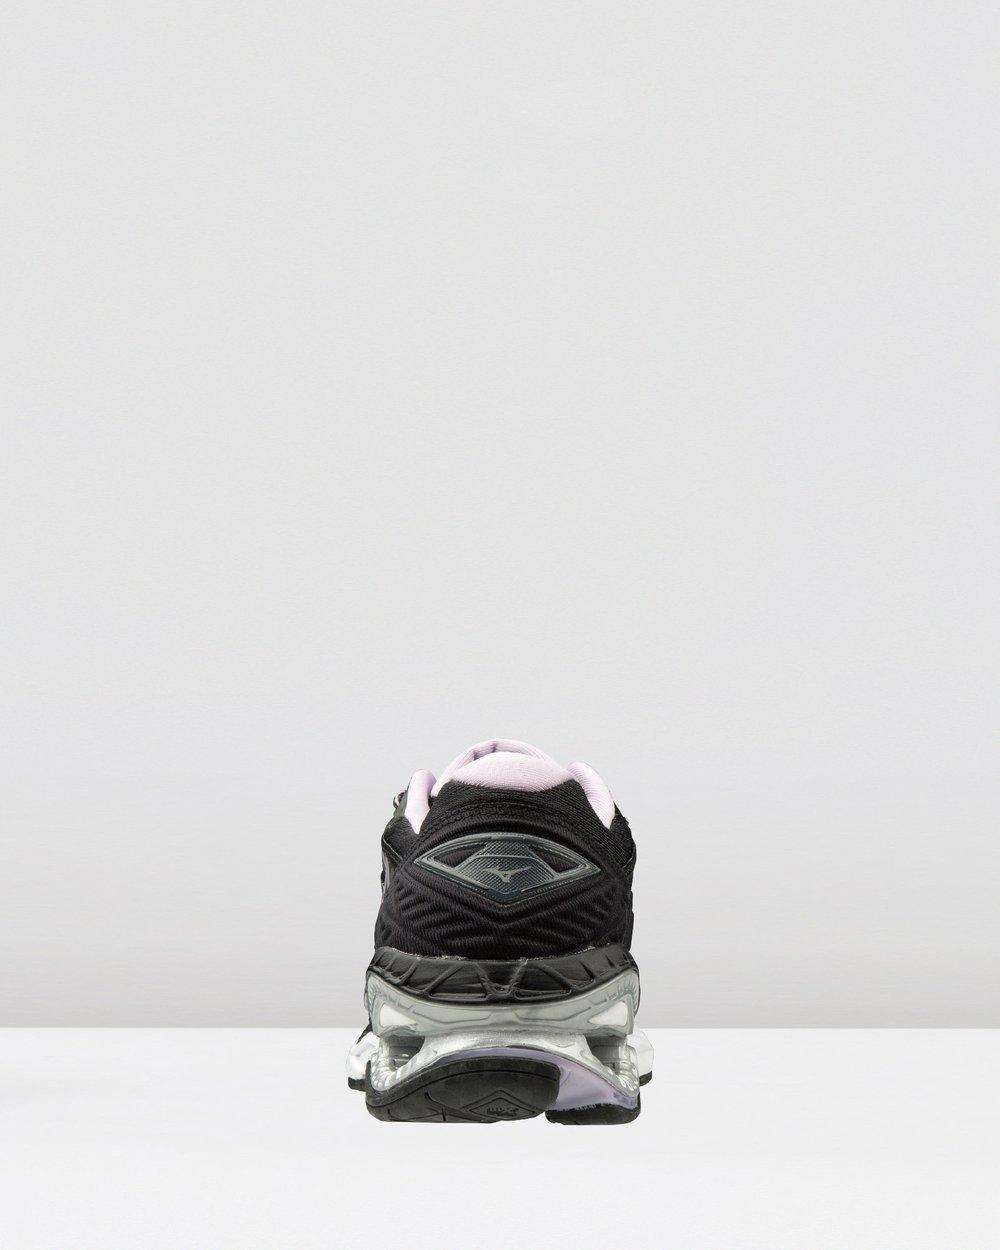 mizuno shoe sizes run small 80